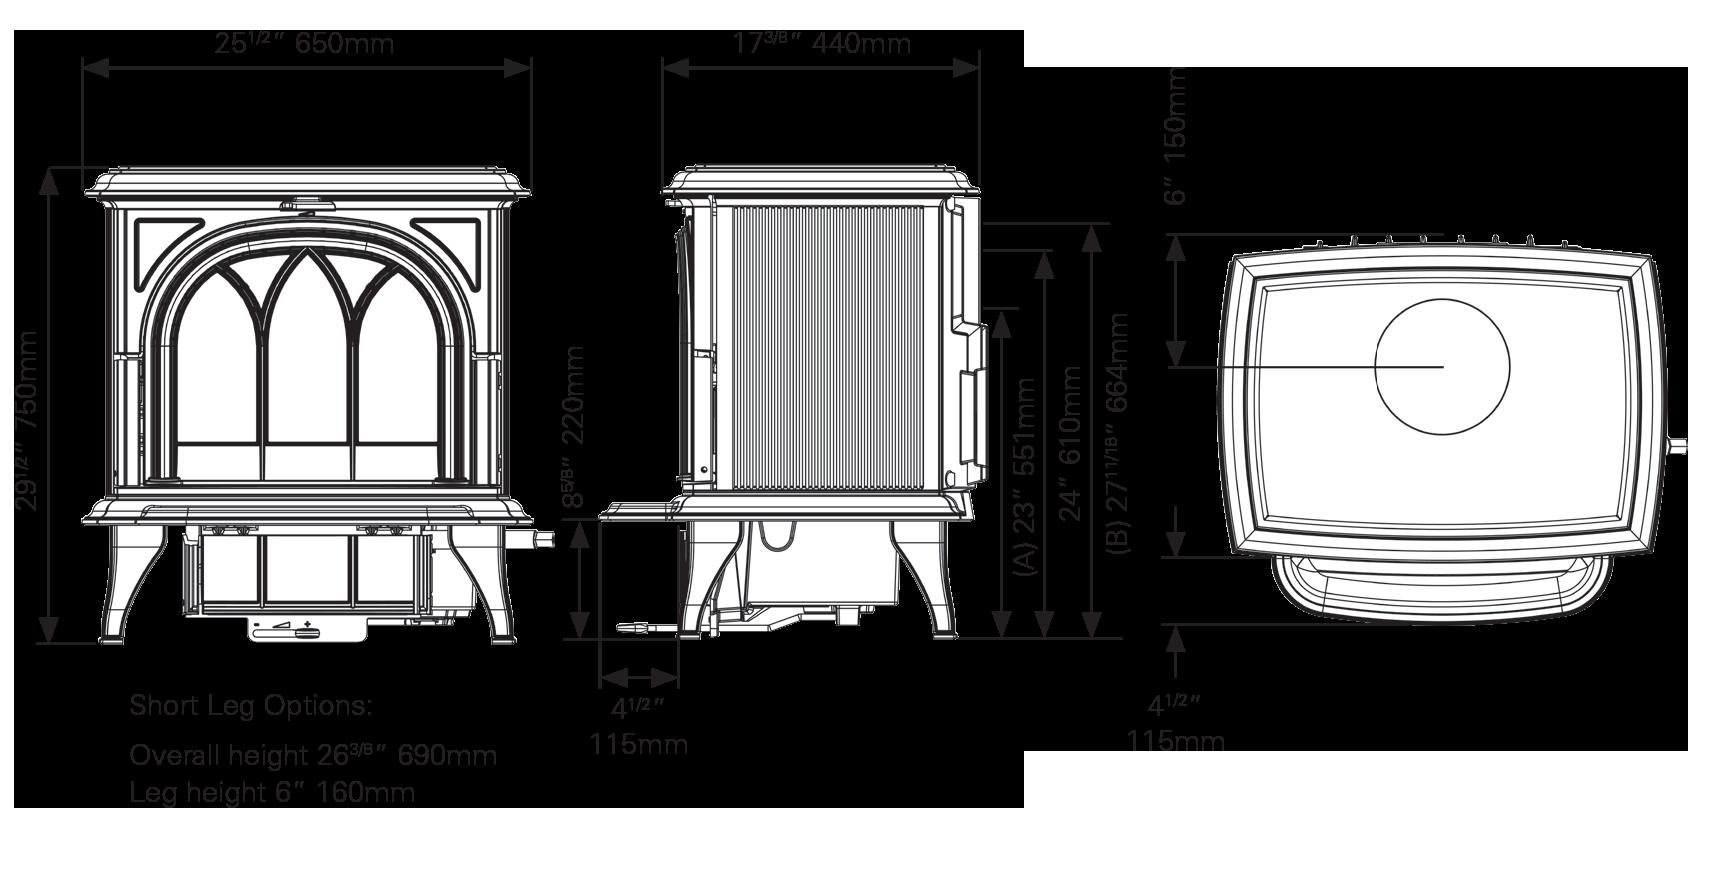 Huntingdon 40 Dimensions